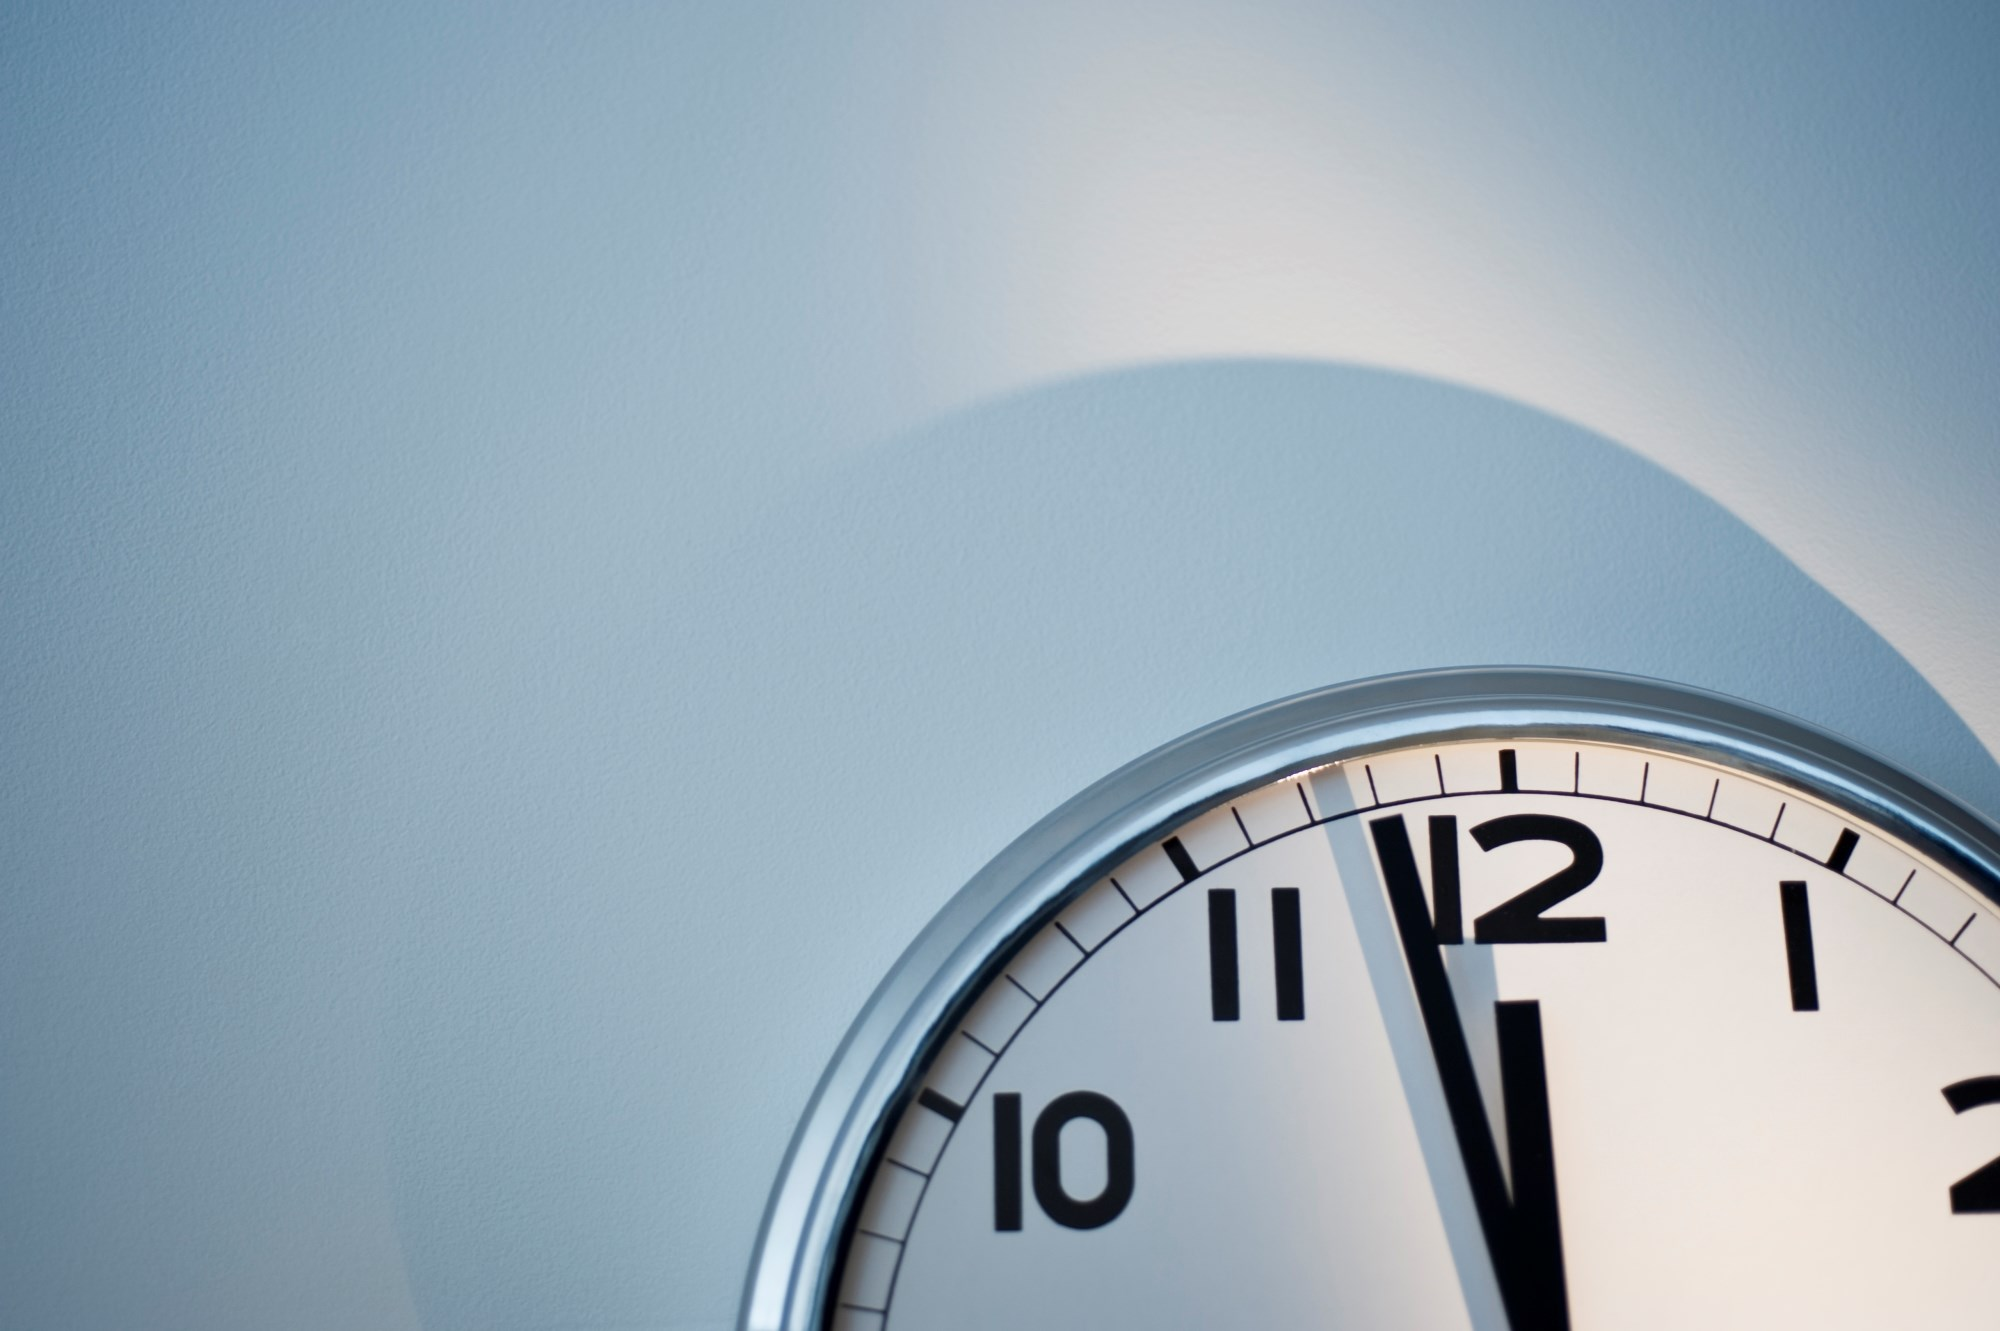 Acute MI Diagnosis: 0/1 Hour Superior to 0/3 Hour Algorithm